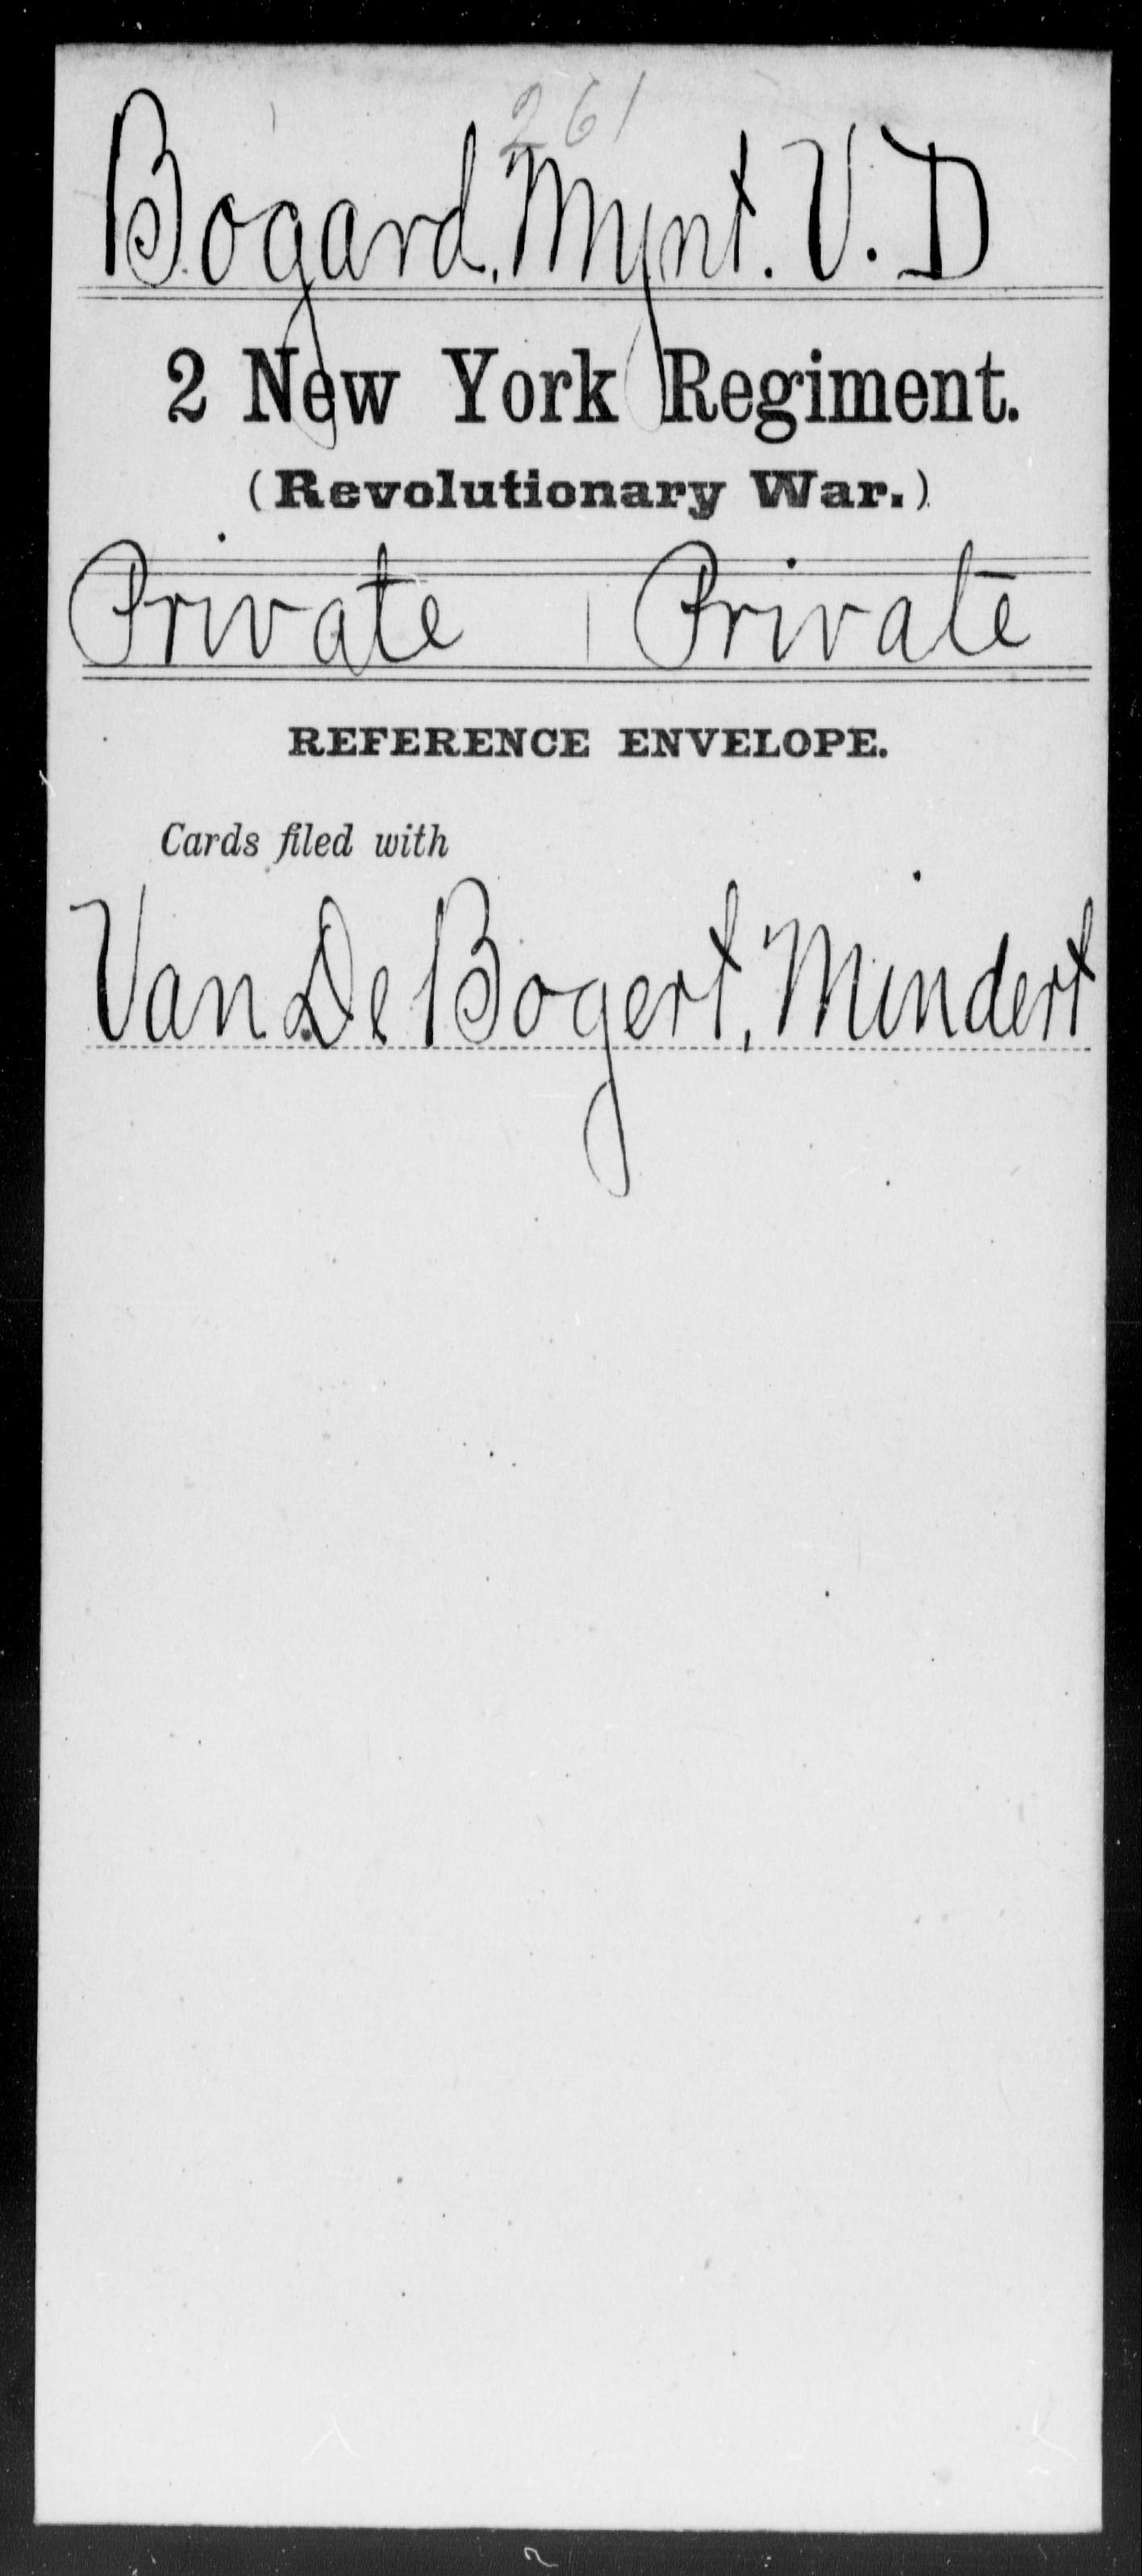 Bogard, Mynt V D - New York - Second Regiment